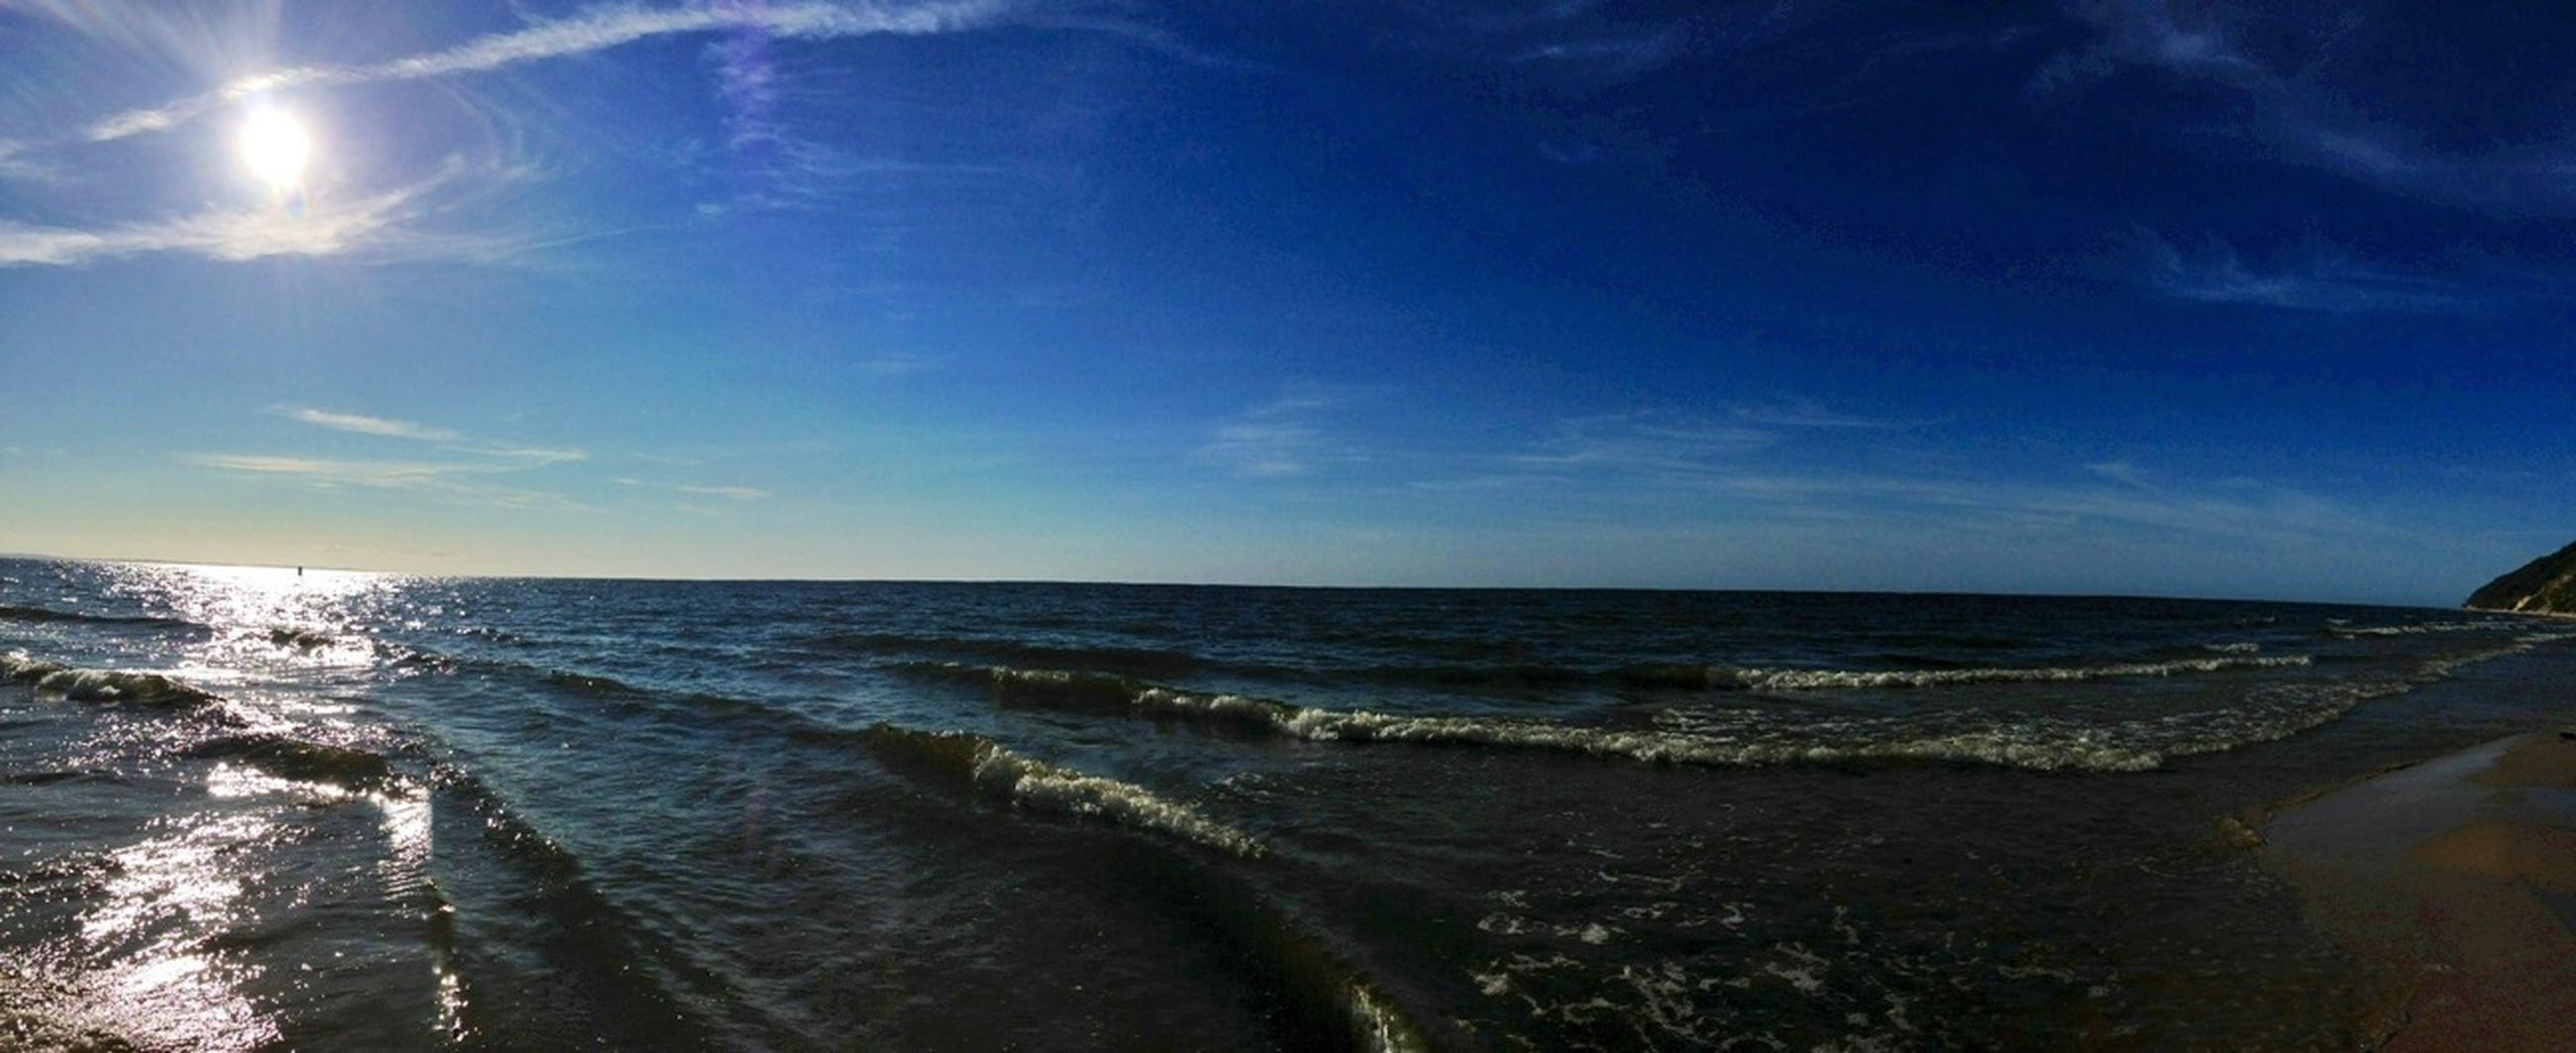 sea, horizon over water, water, beach, sky, tranquil scene, scenics, tranquility, beauty in nature, shore, blue, nature, idyllic, sand, coastline, wave, sunlight, panoramic, cloud - sky, cloud